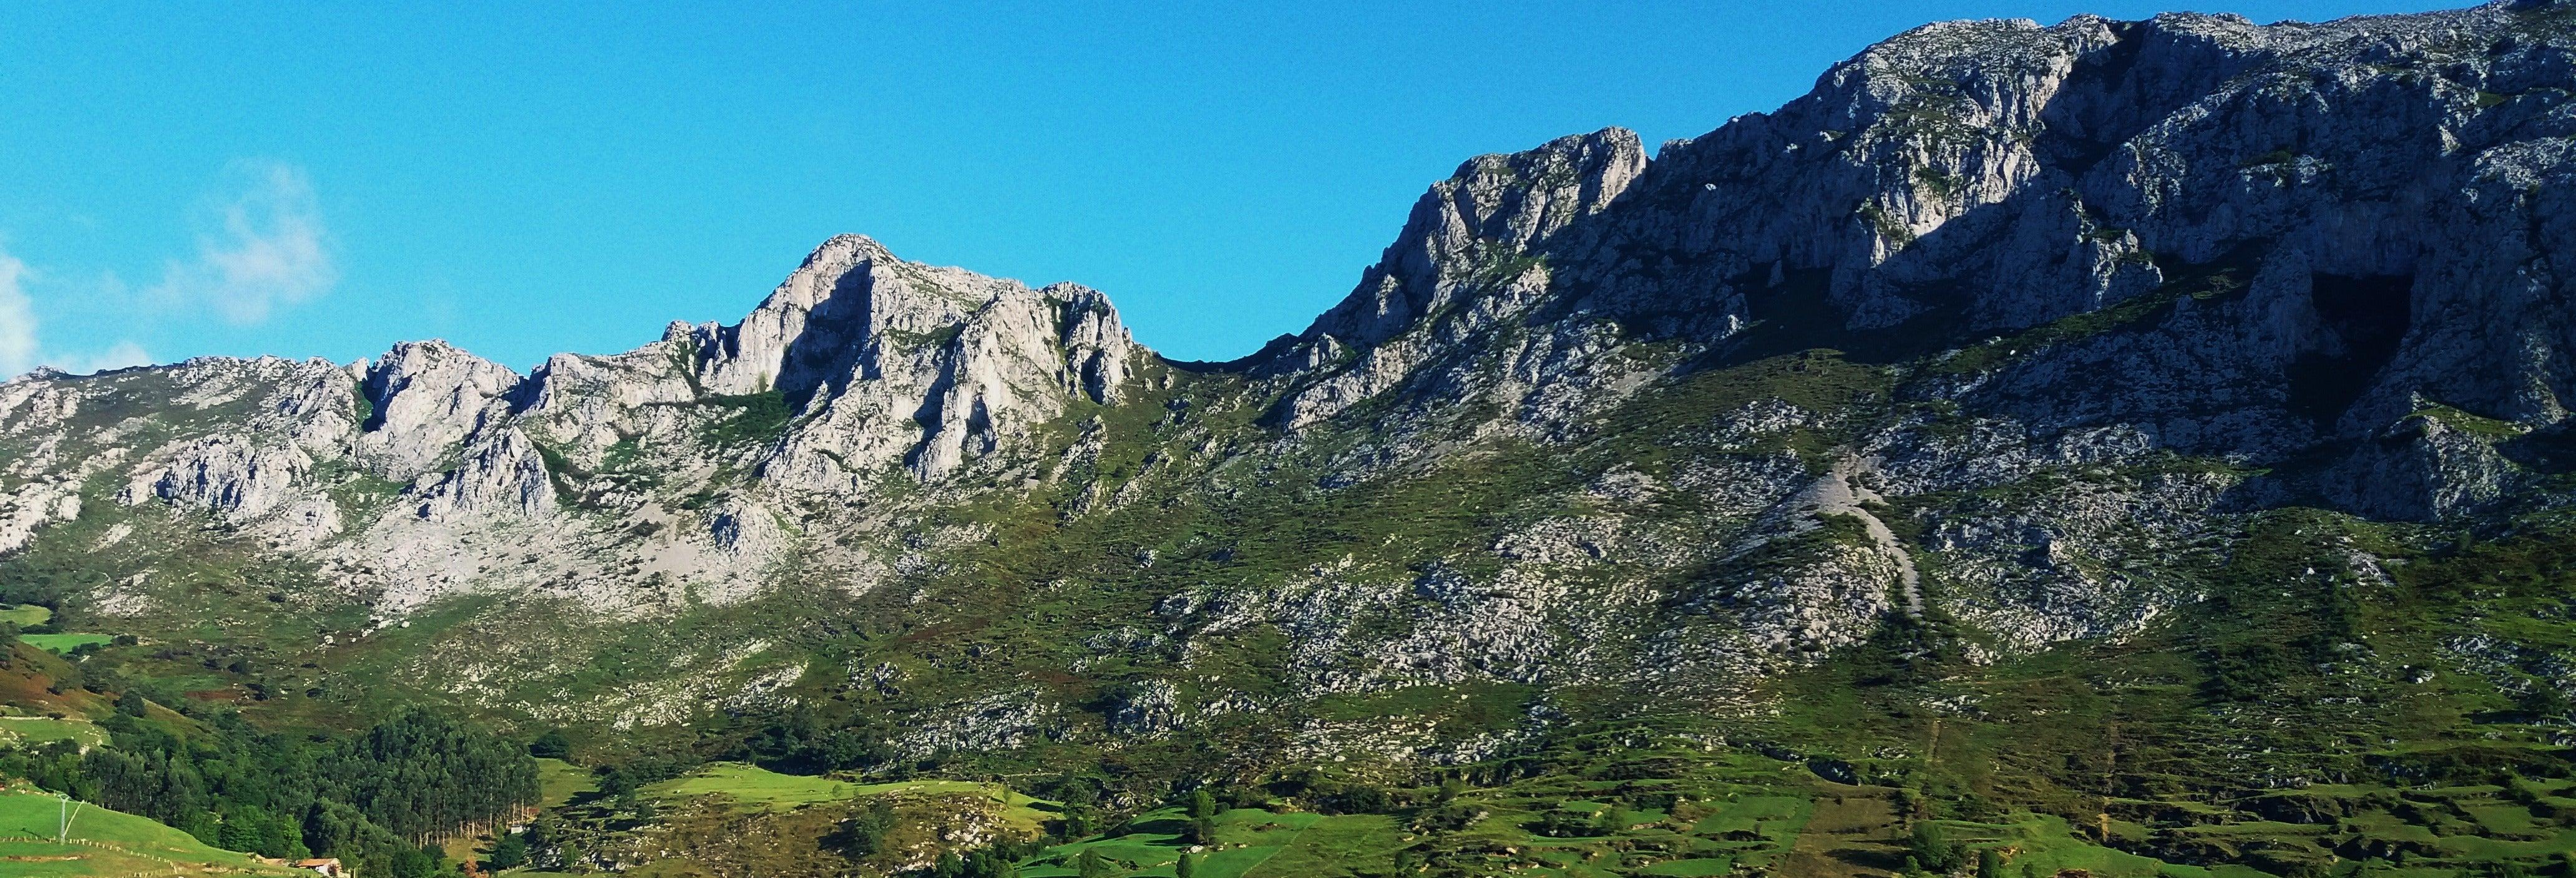 Pilgrimage Day: Santo Toribio de Liebana Way